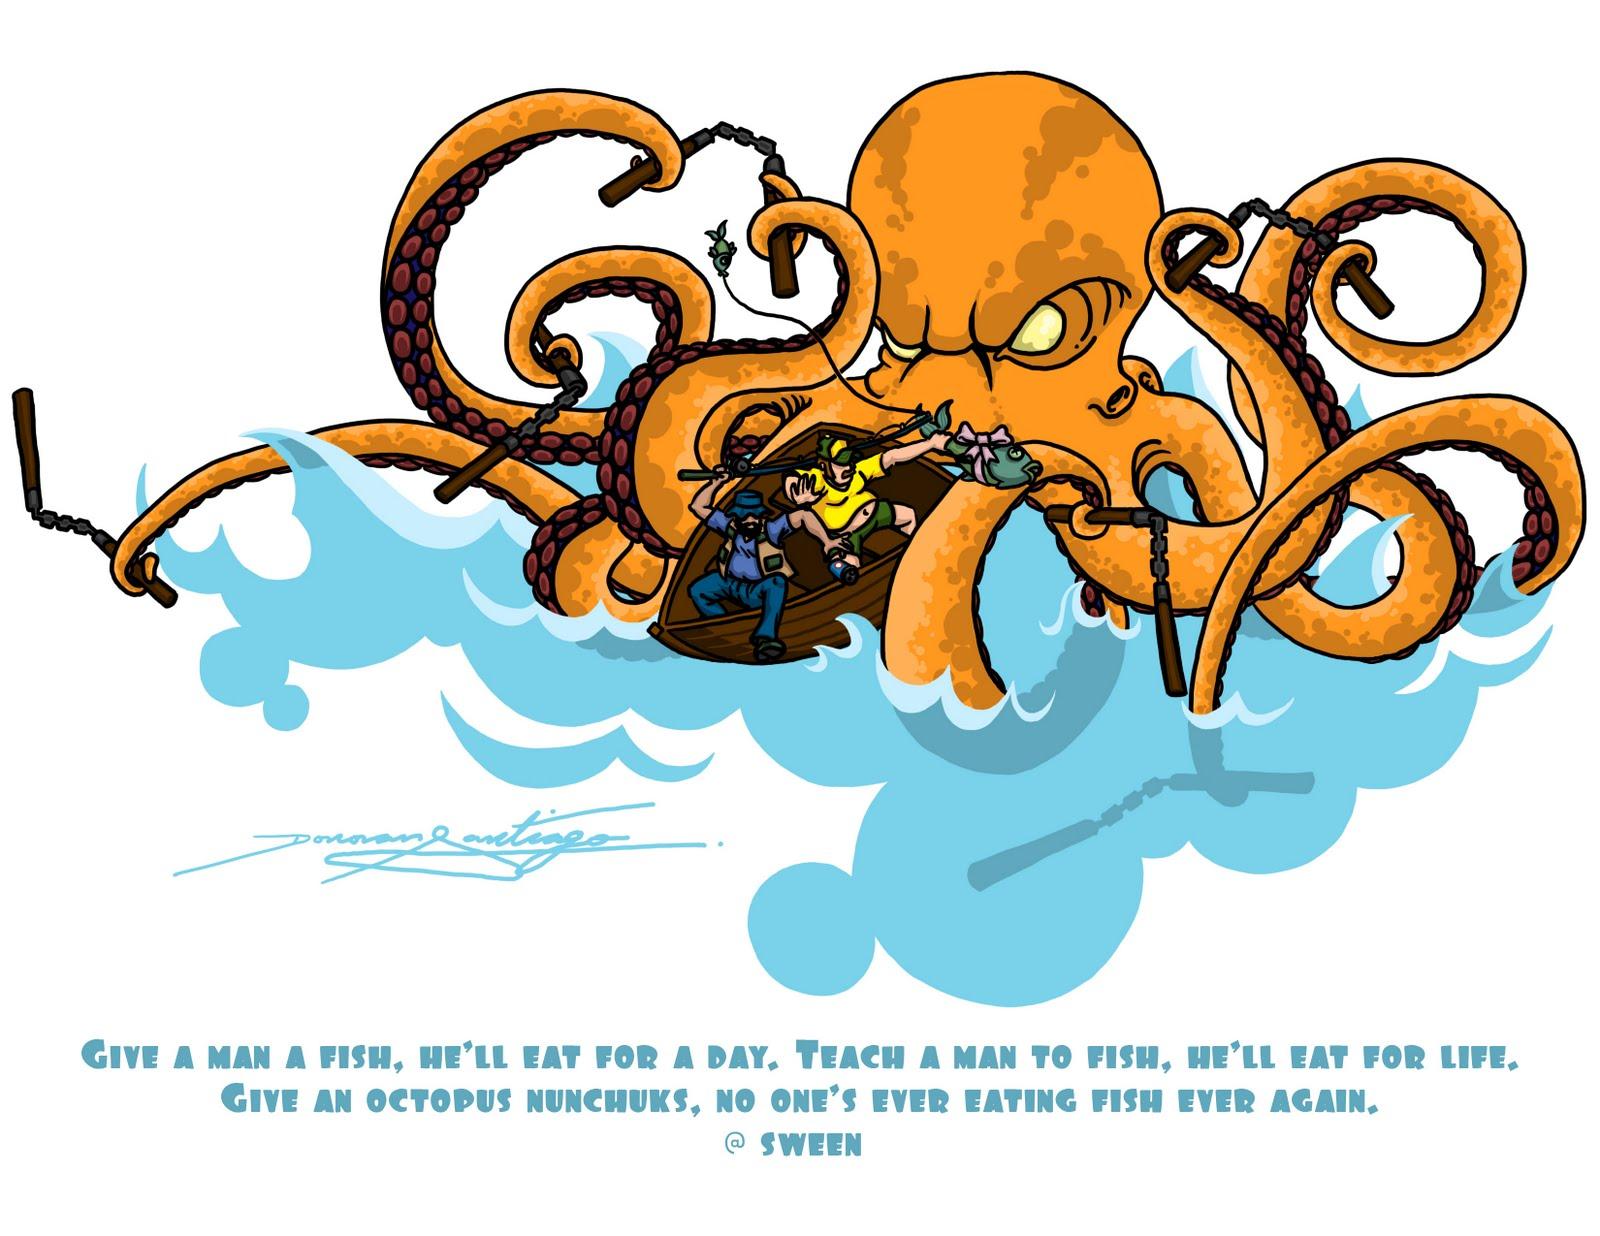 http://3.bp.blogspot.com/-BlzXhuIAr28/TceDkXSE5EI/AAAAAAAAAJc/tuOb3SCOK9c/s1600/Octopus%2BNunchucks.jpg